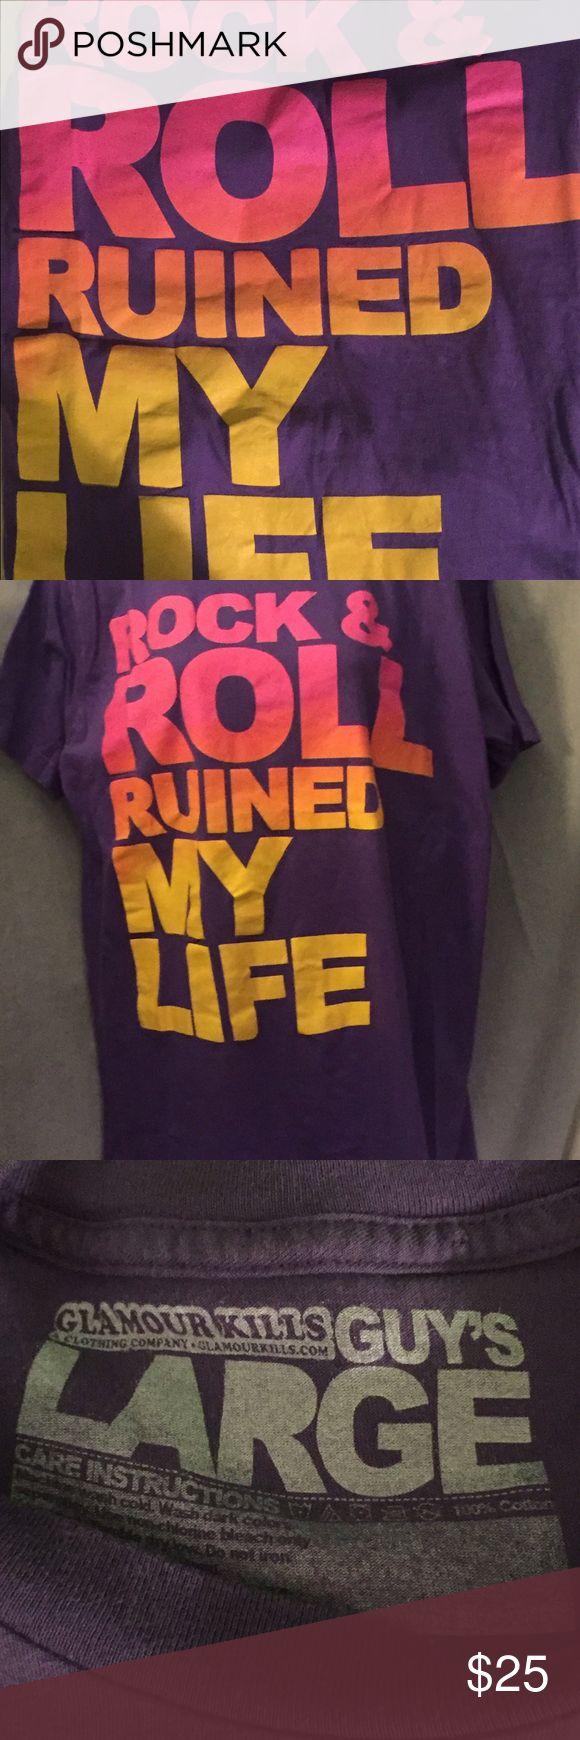 Men's glamour kills tee Rock n roll ruined my life purple tee Shirts Tees - Short Sleeve